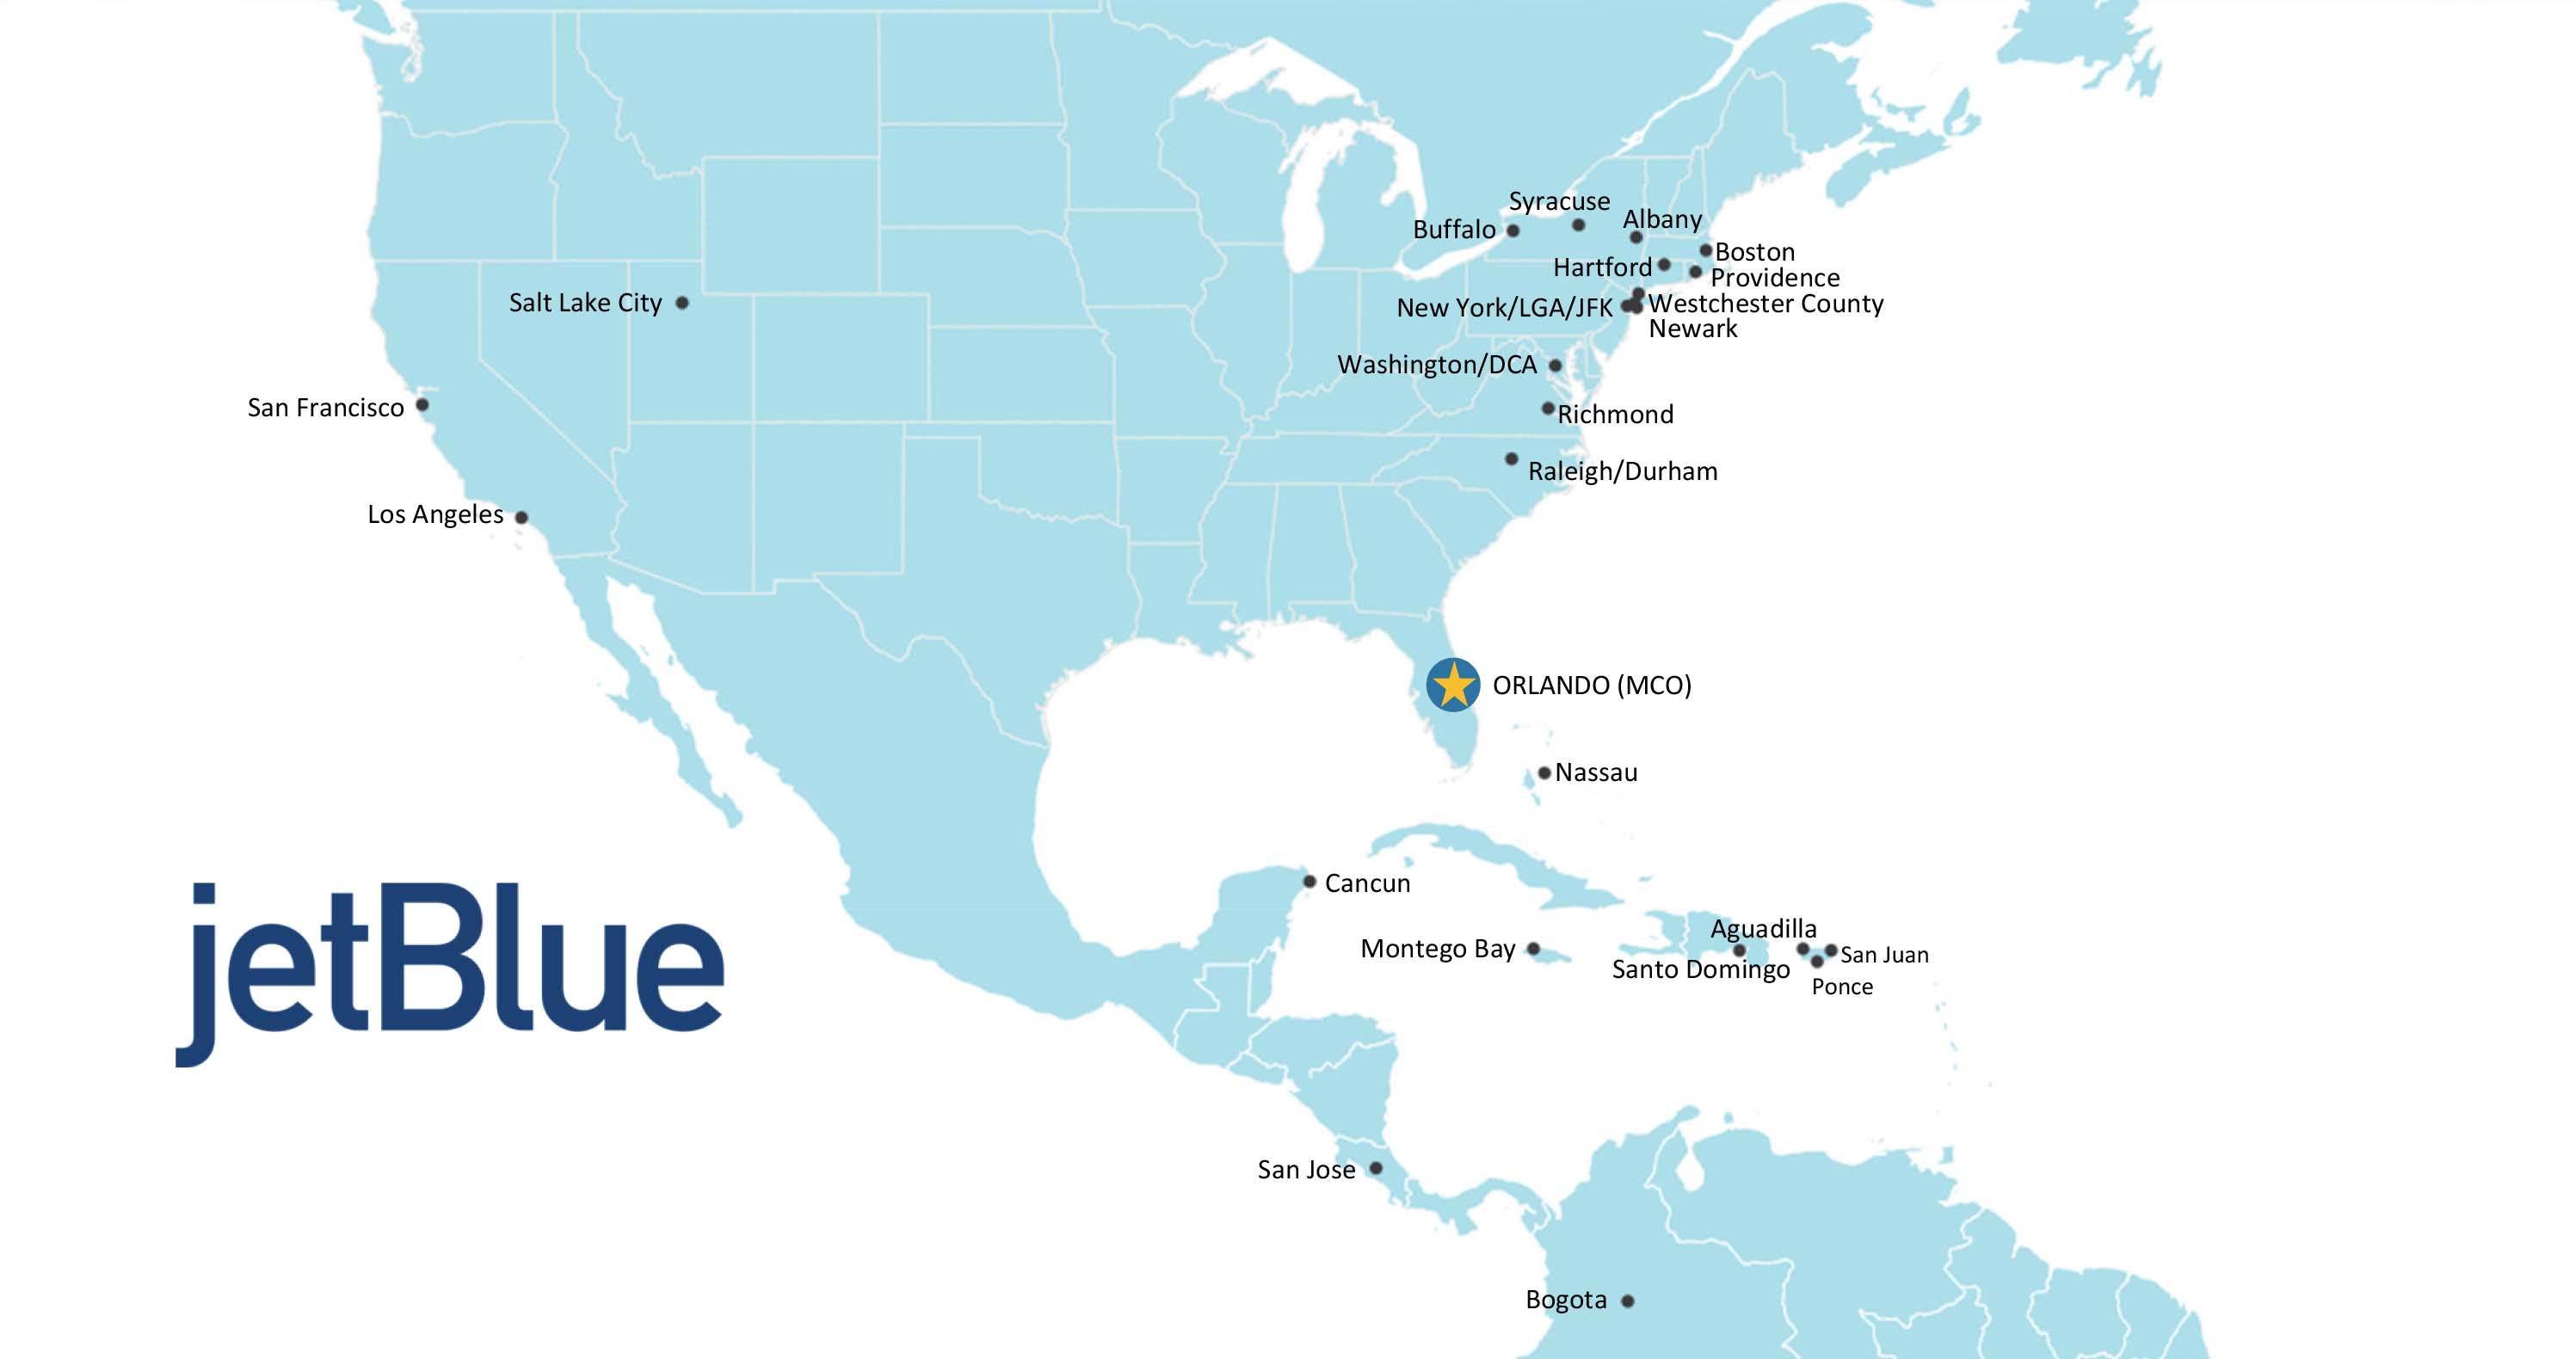 JetBlue Route Map